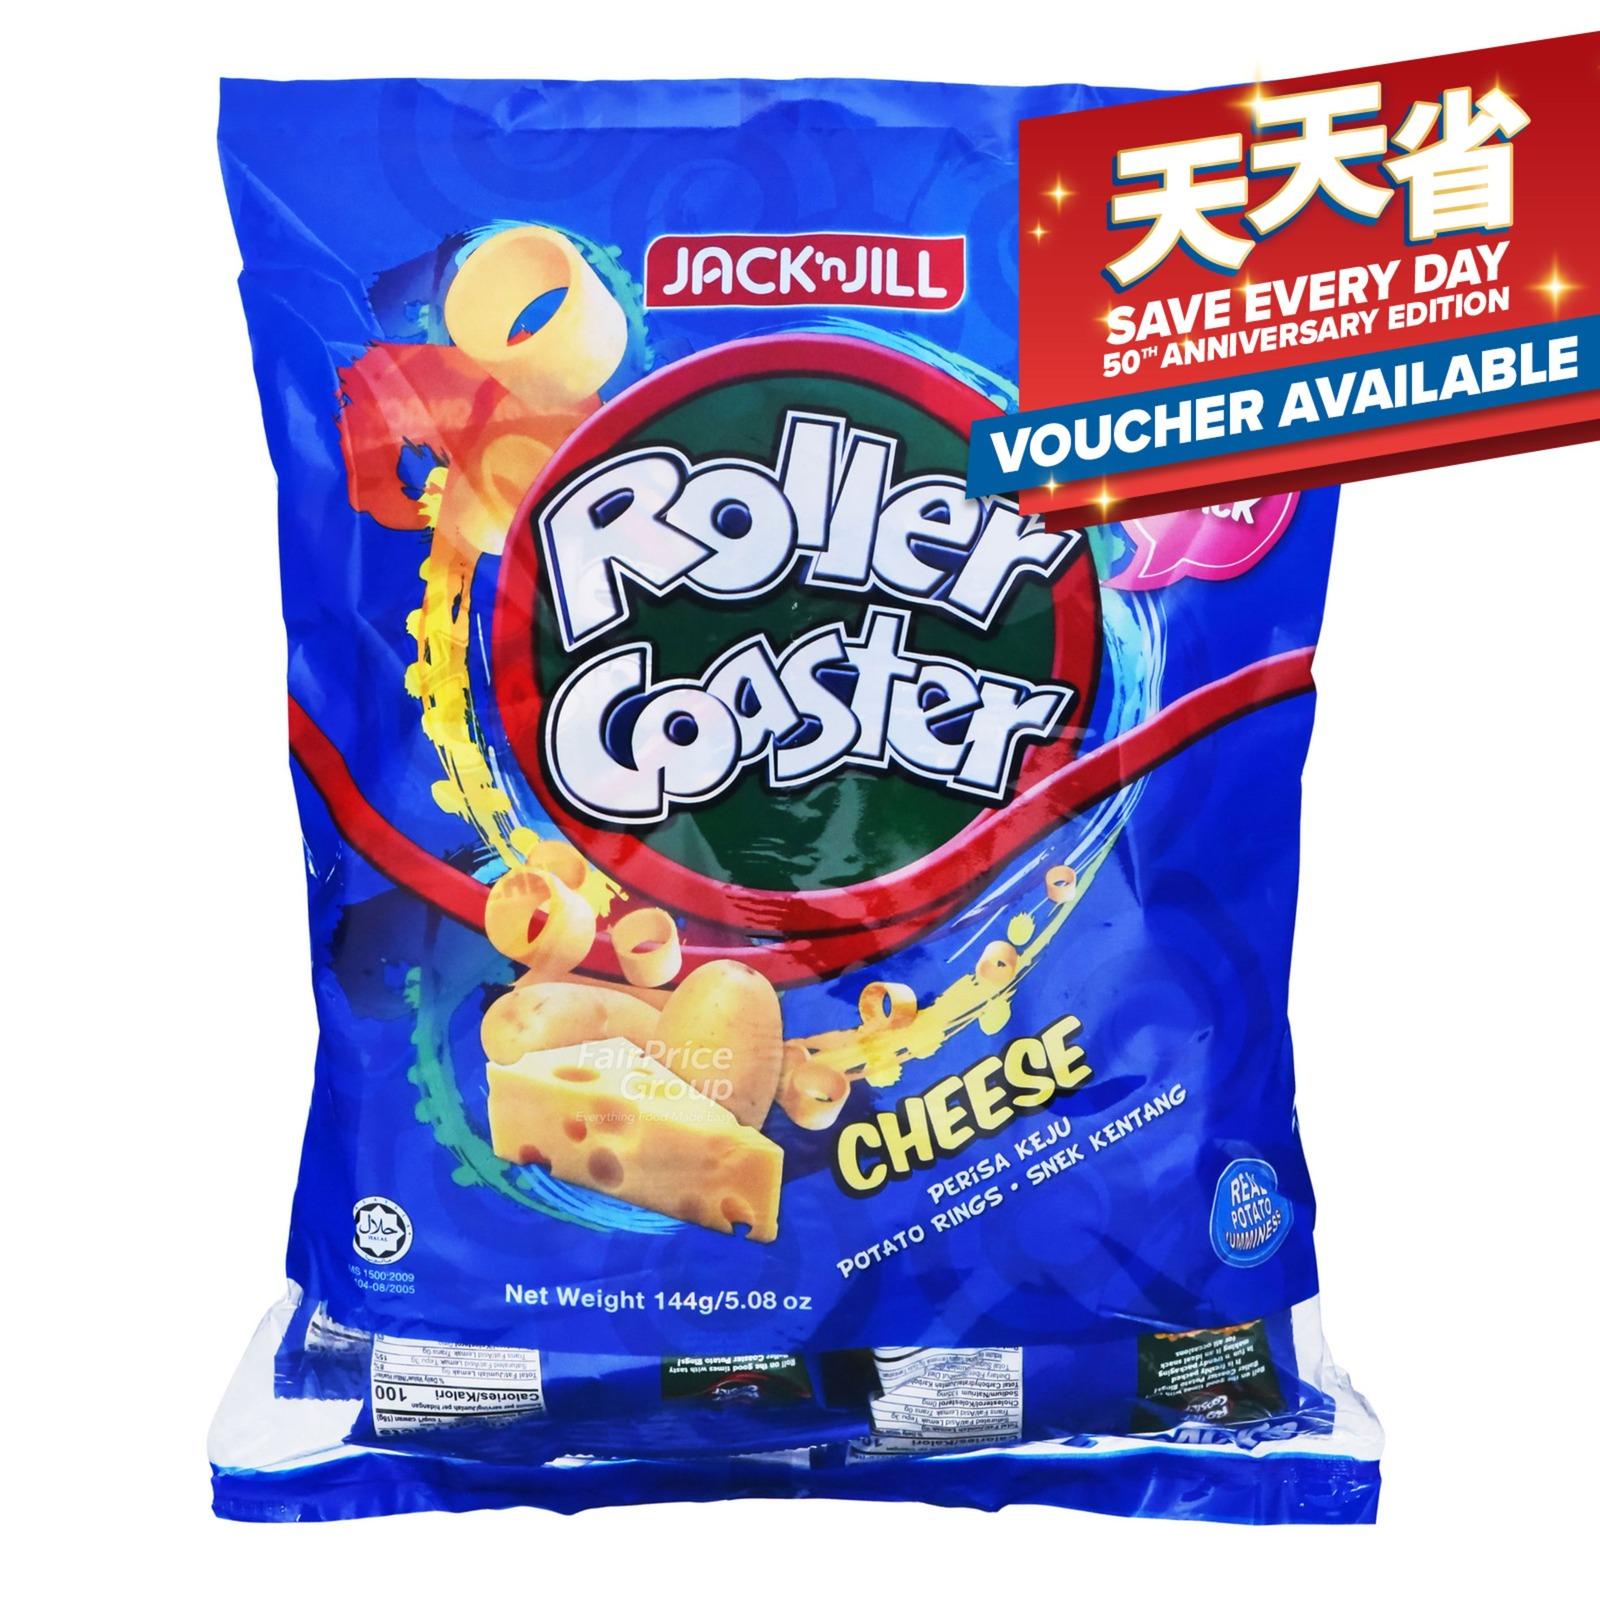 Jack 'n Jill Roller Coaster Potato Rings - Cheese